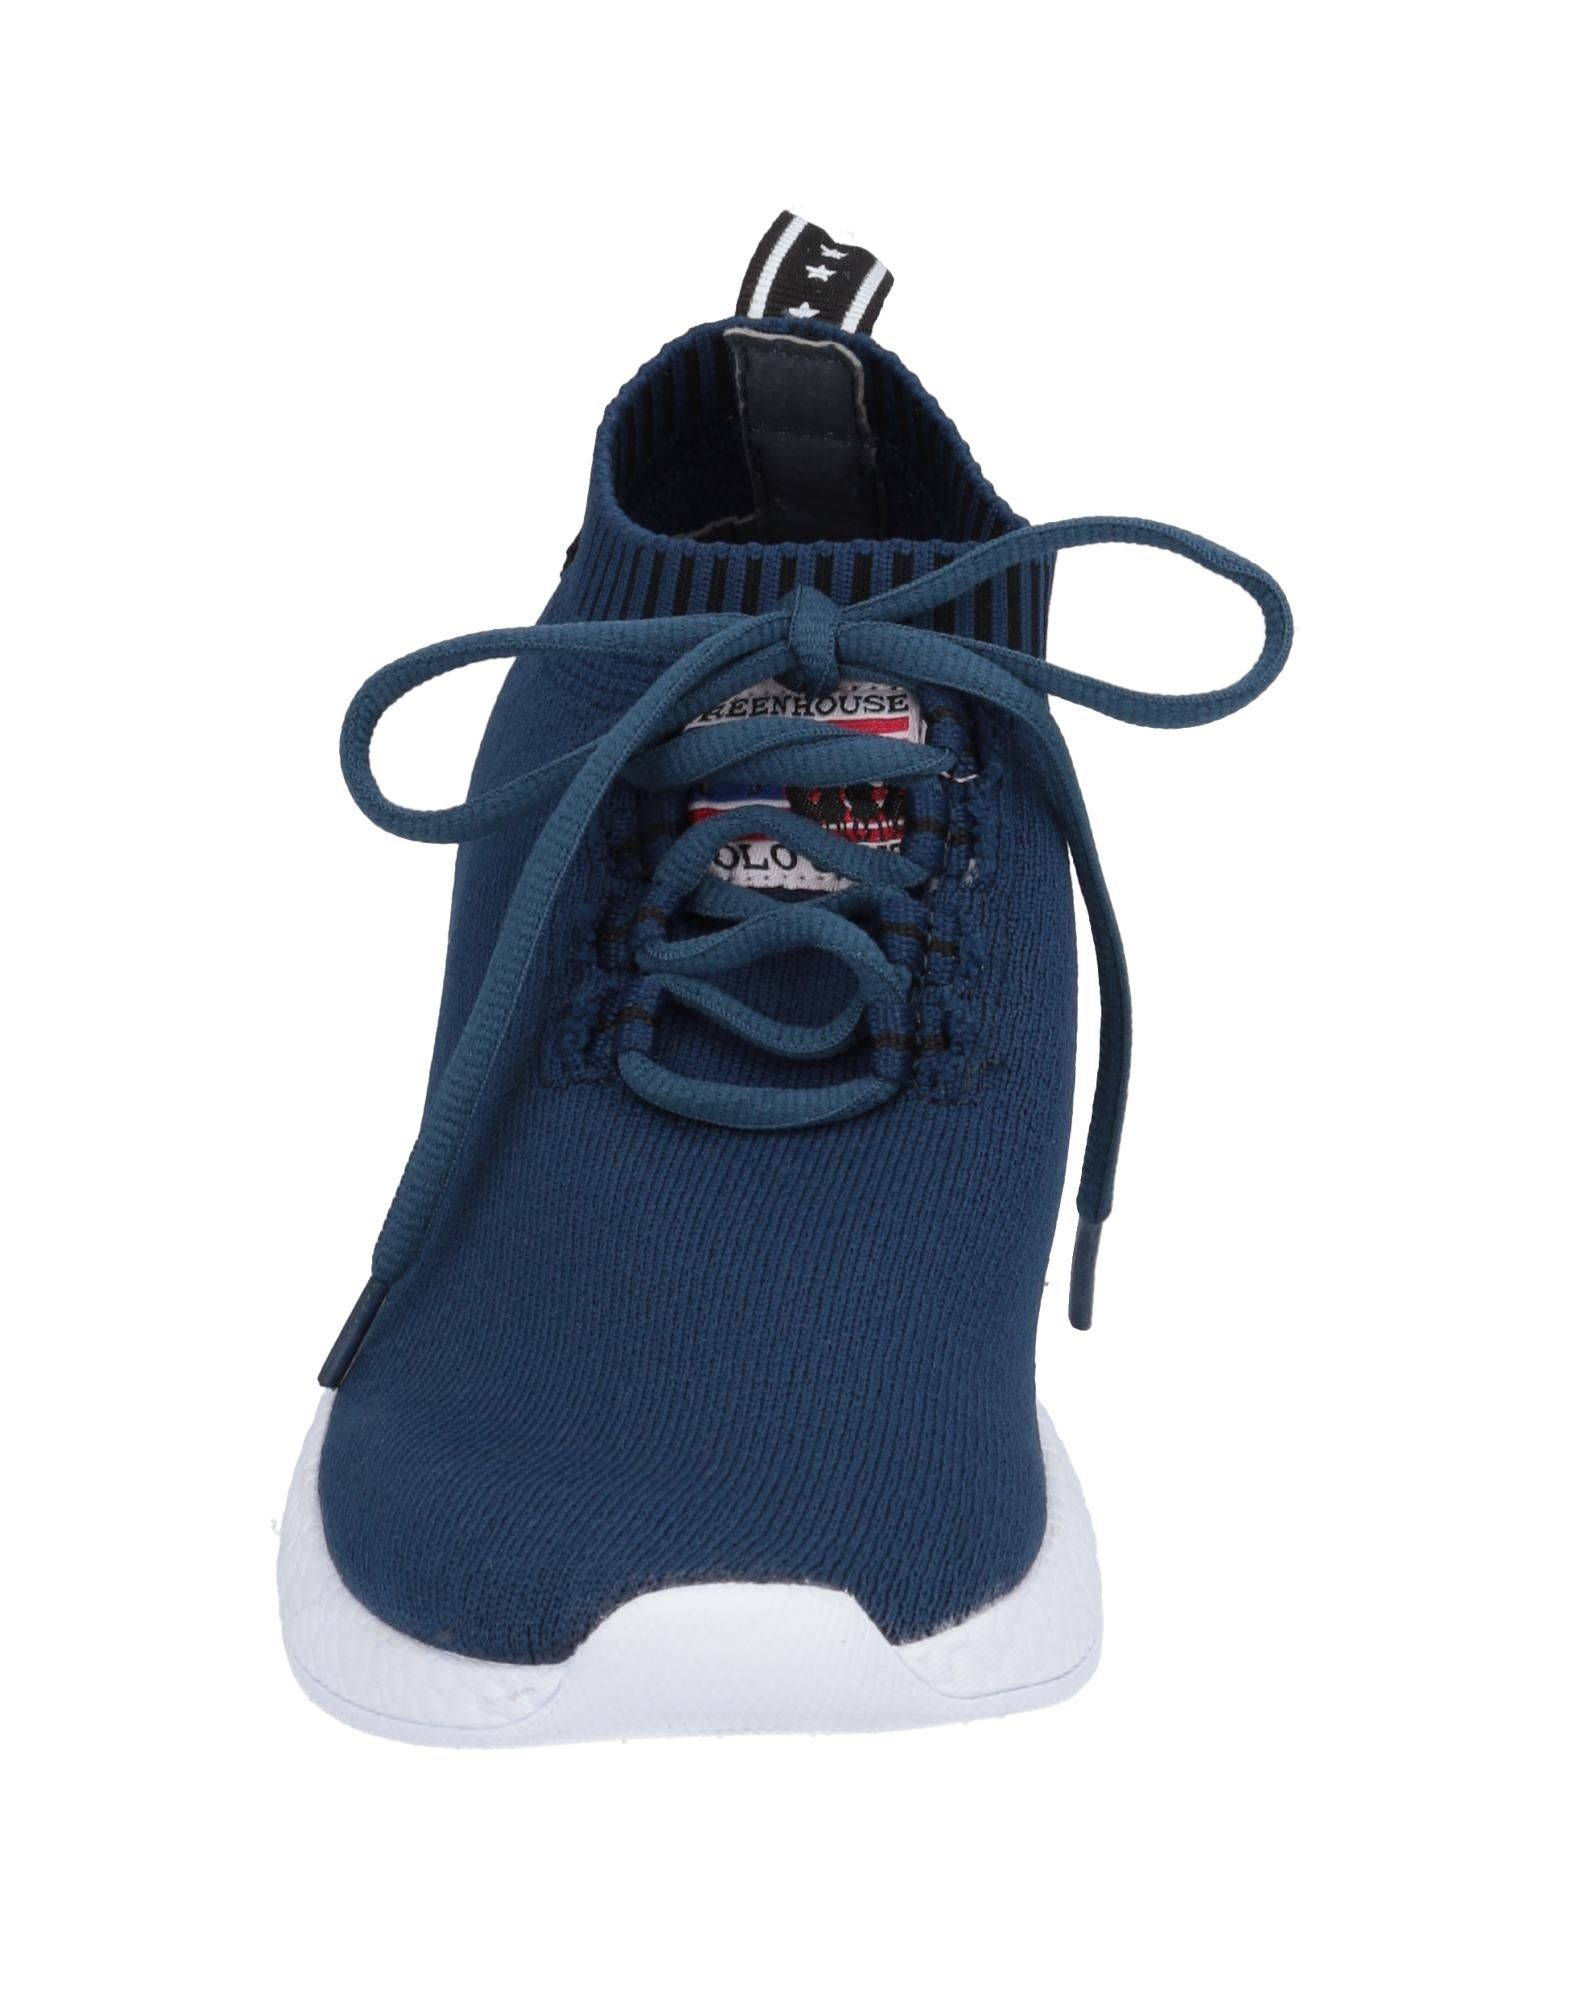 Greenhouse Polo Polo Polo Club Sneakers - Men Greenhouse Polo Club Sneakers online on  Australia - 11566749IA d9d465